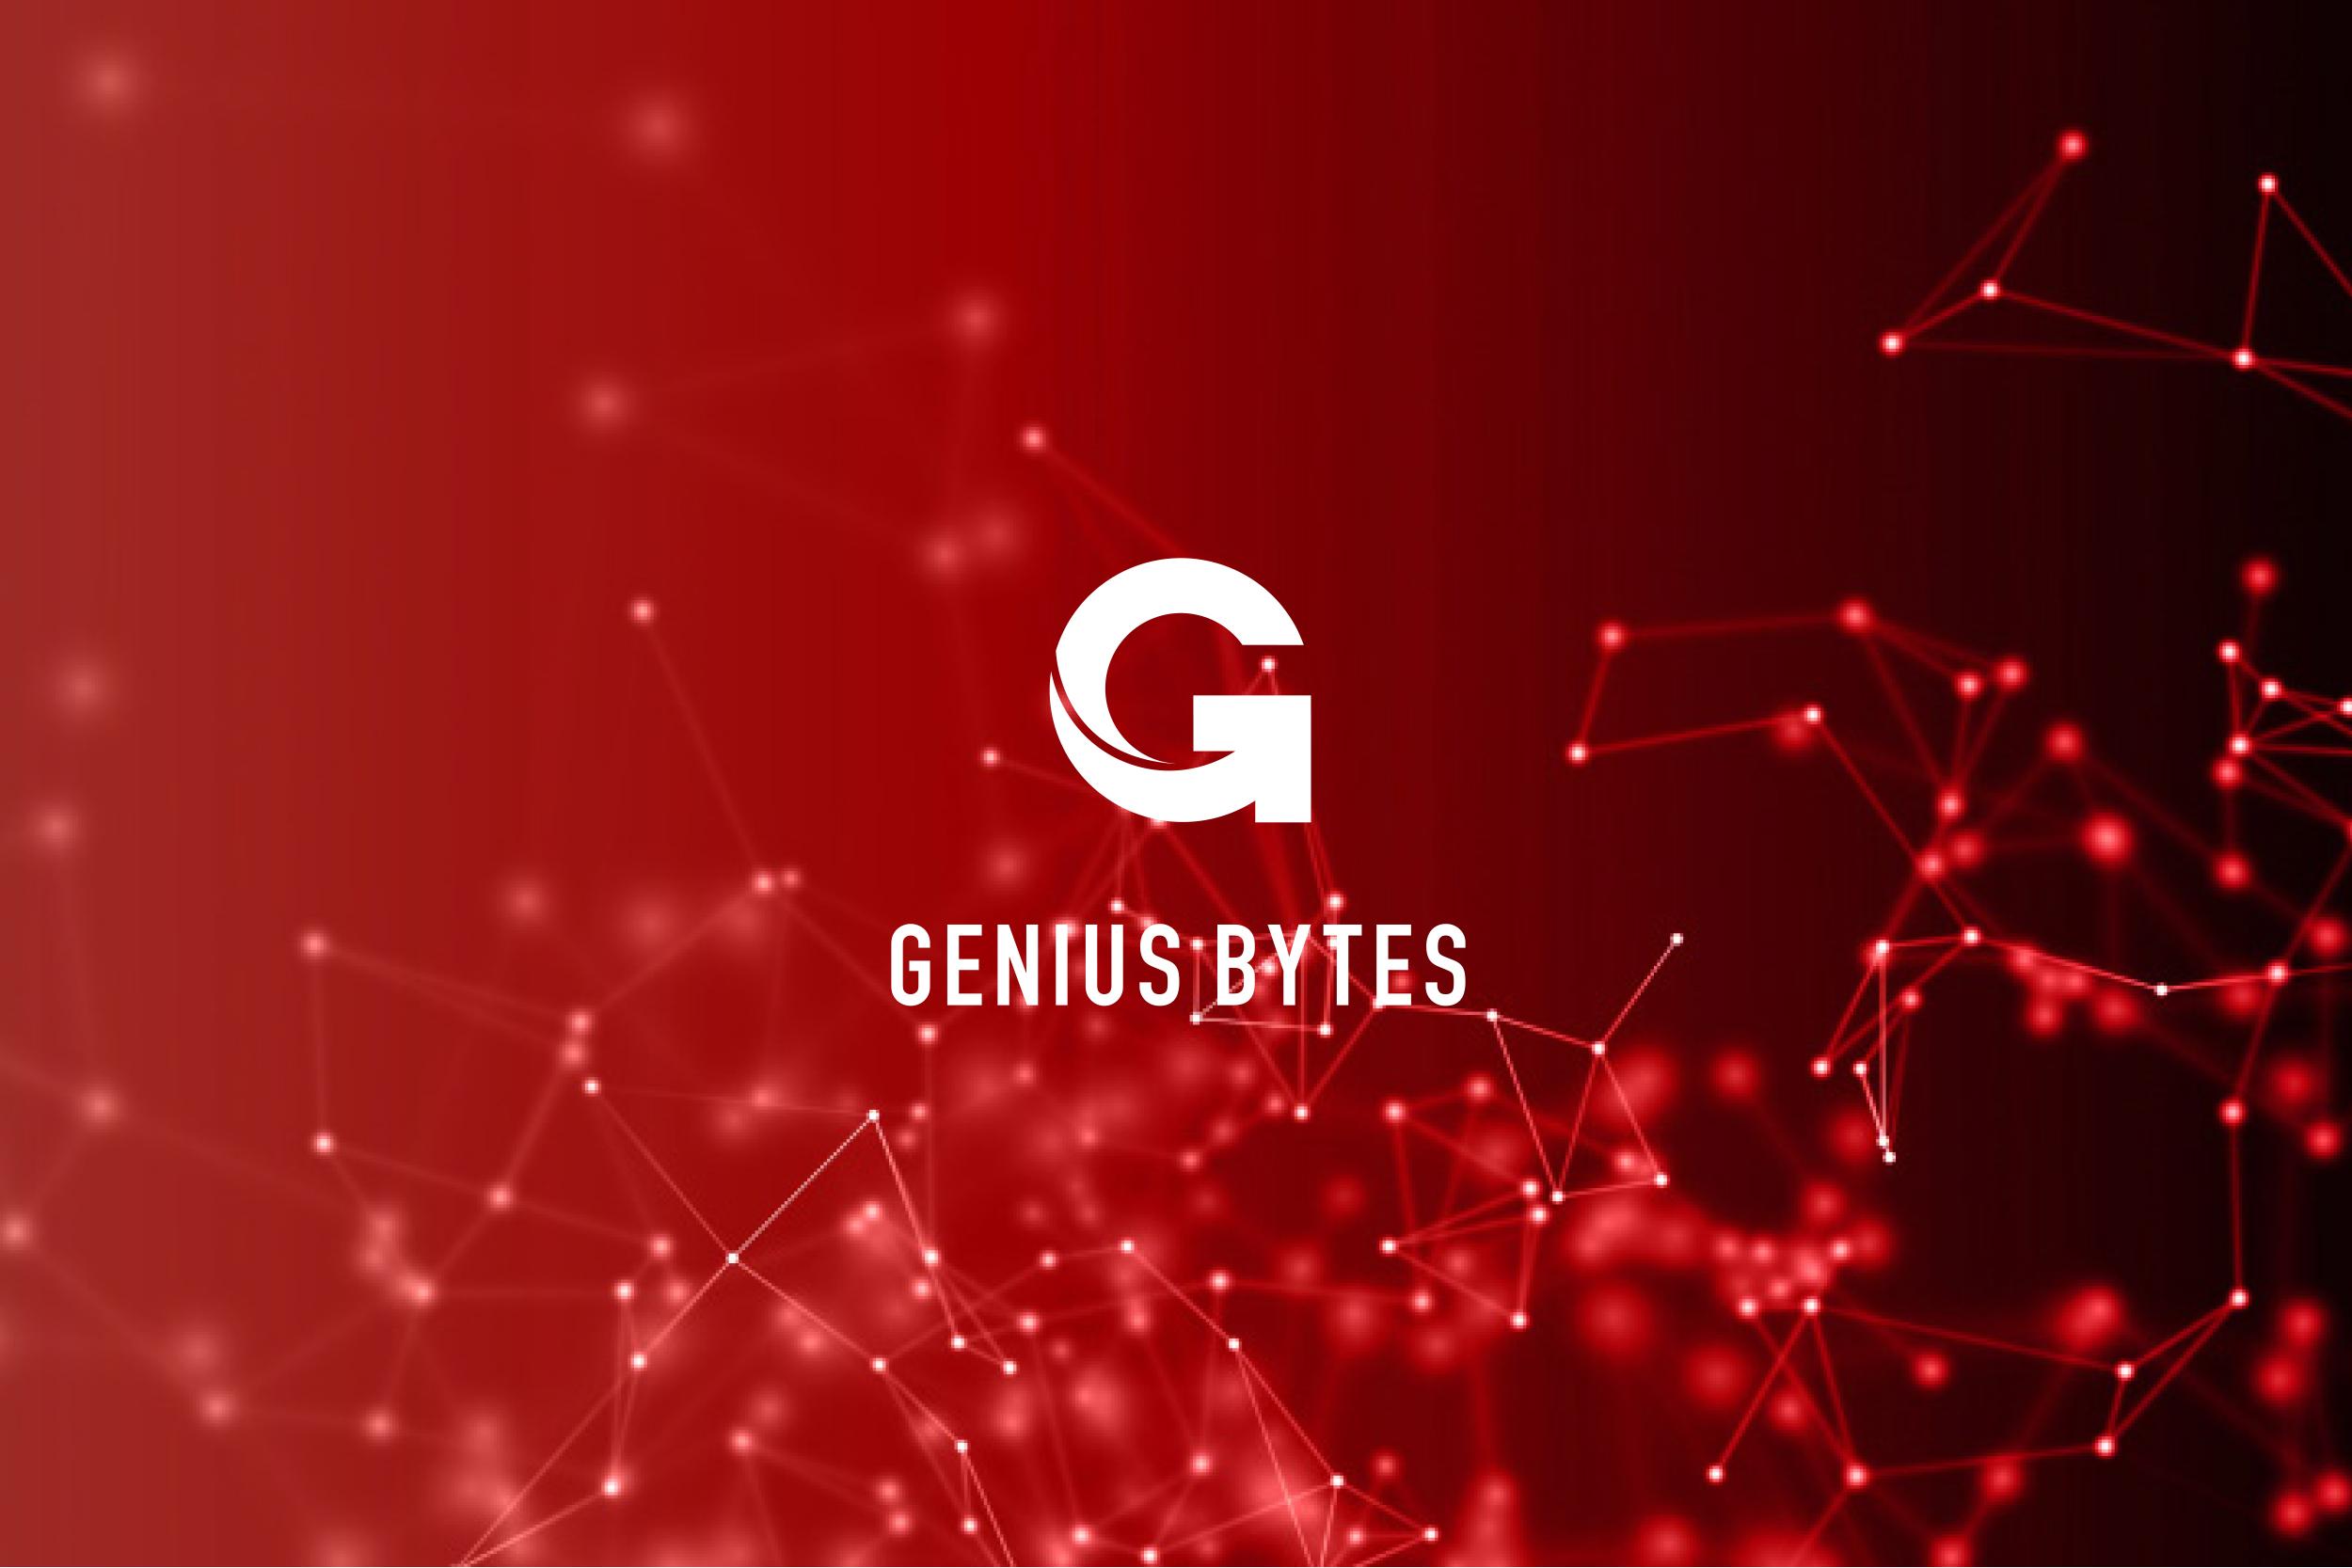 Genius bytes_1.jpg